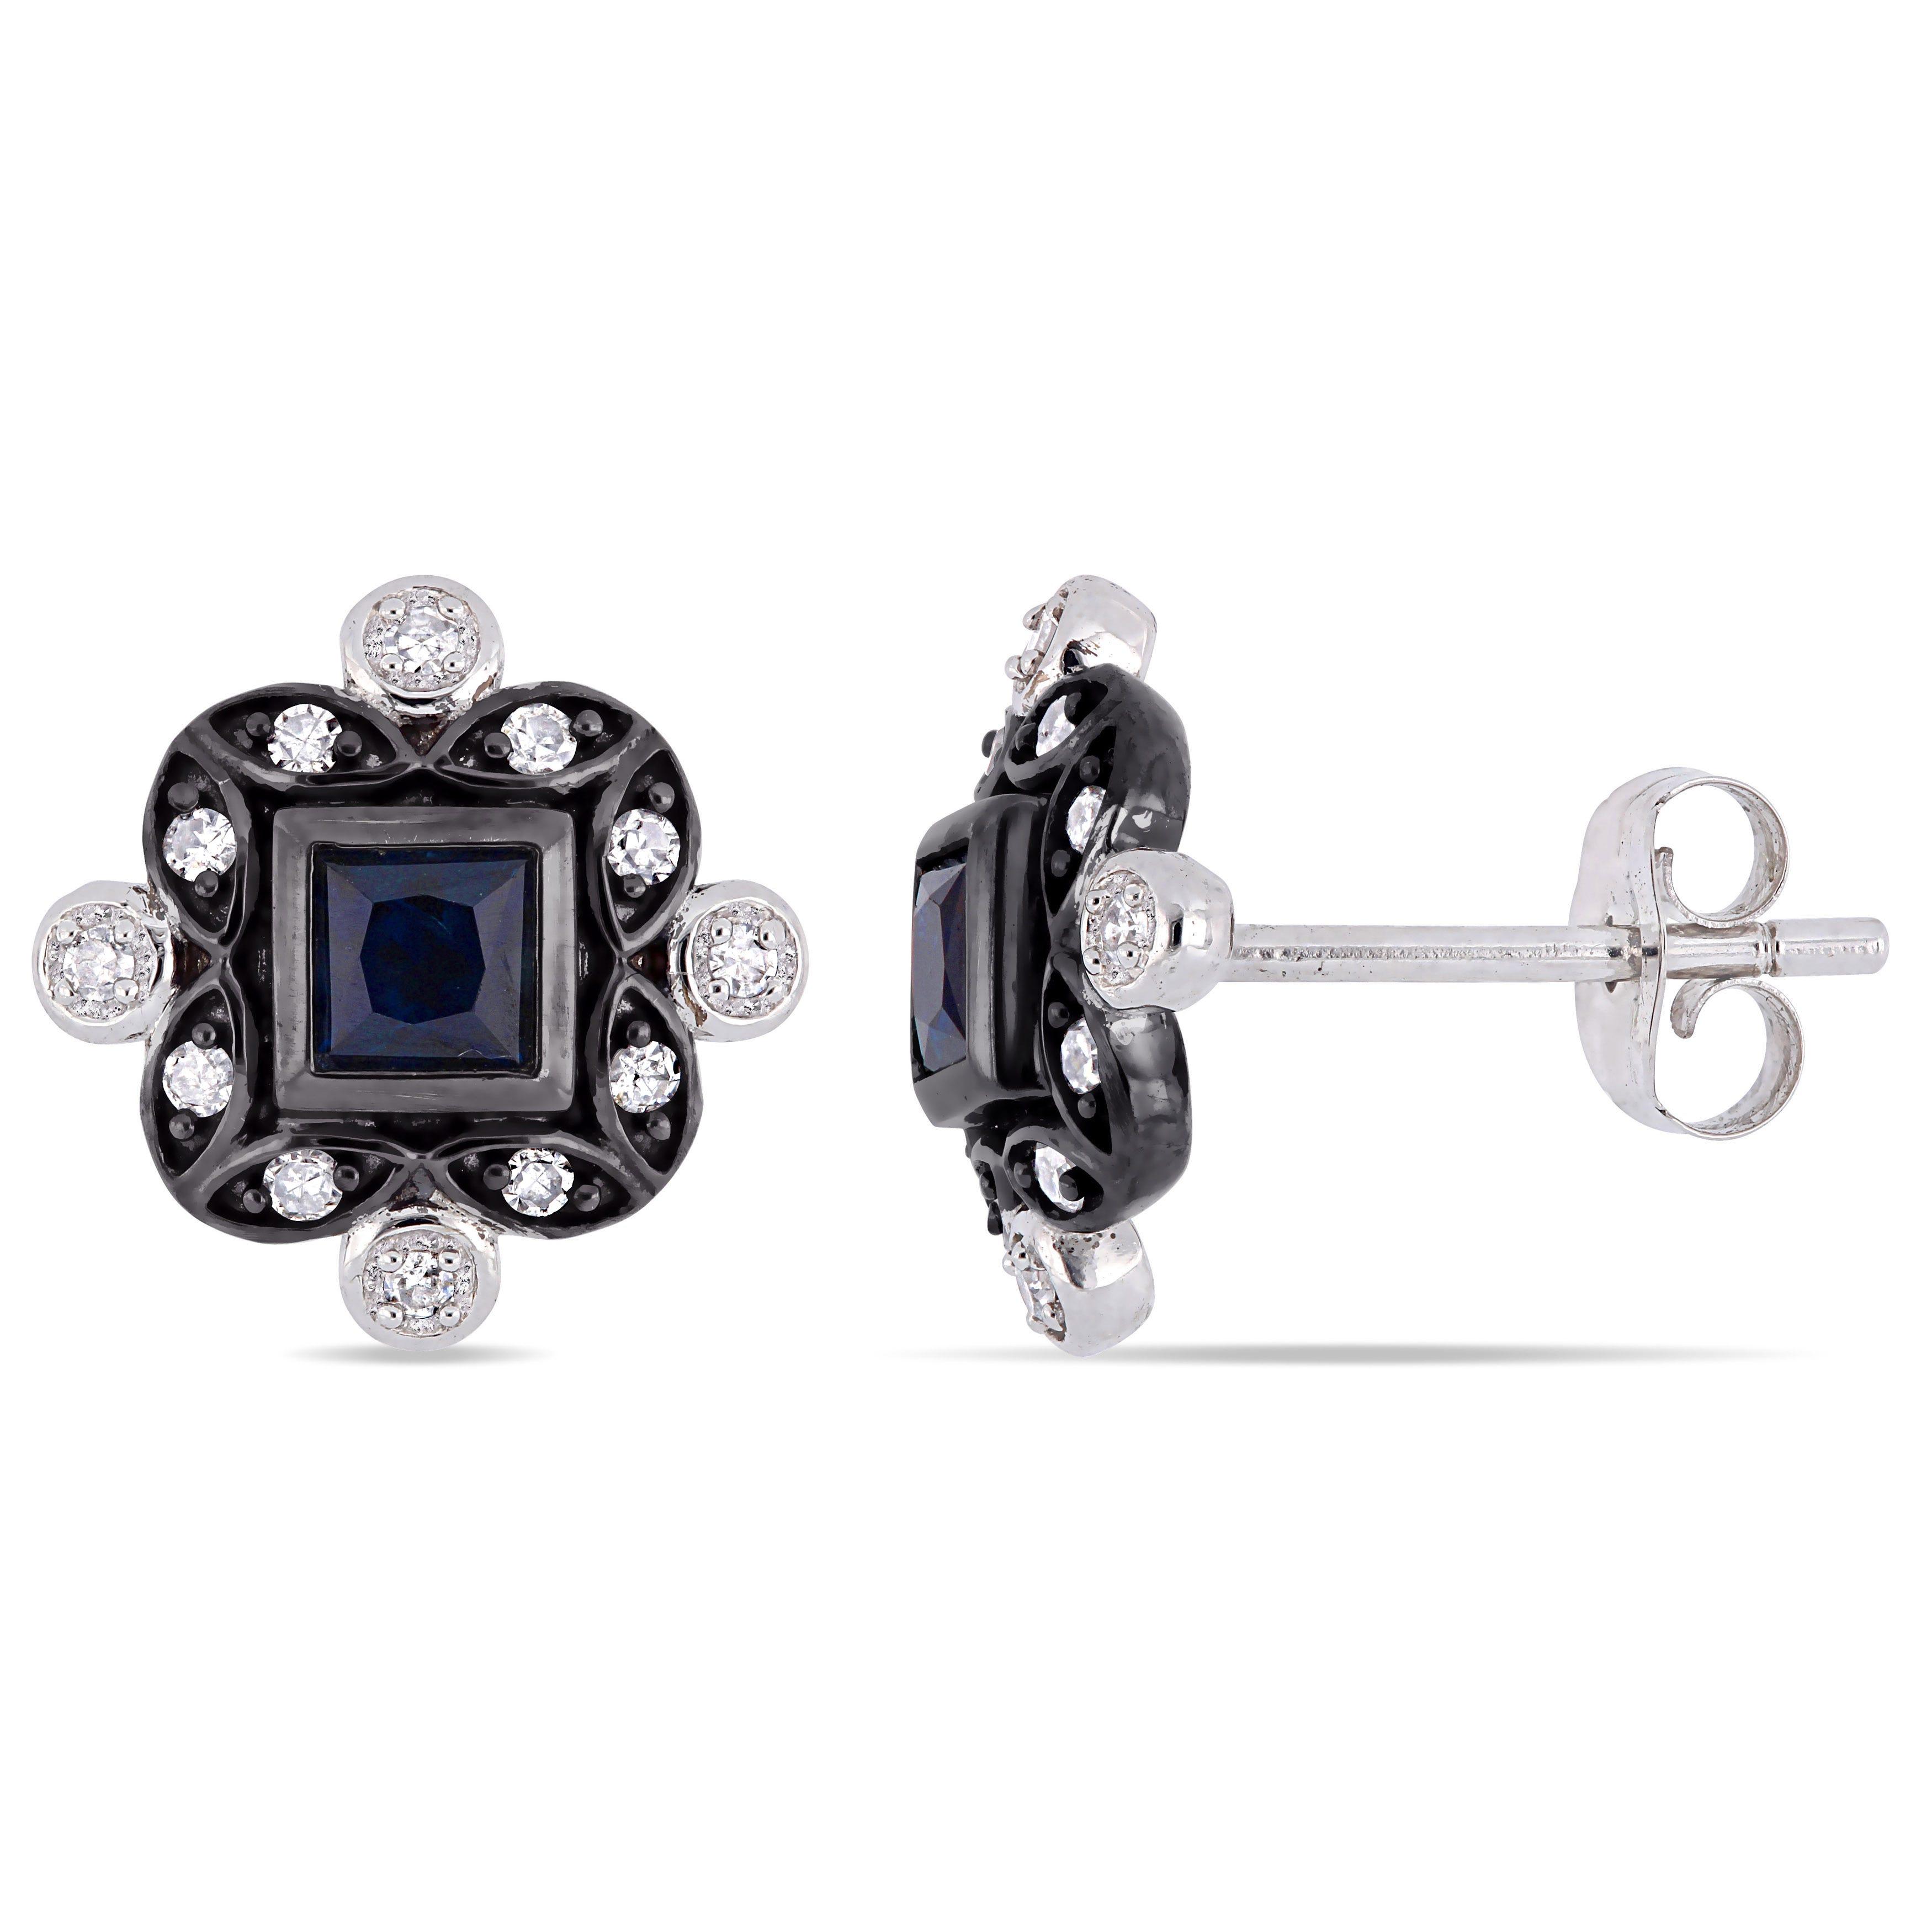 Everly Diamond & Blue Sapphire Stud Earrings in 10k White Gold